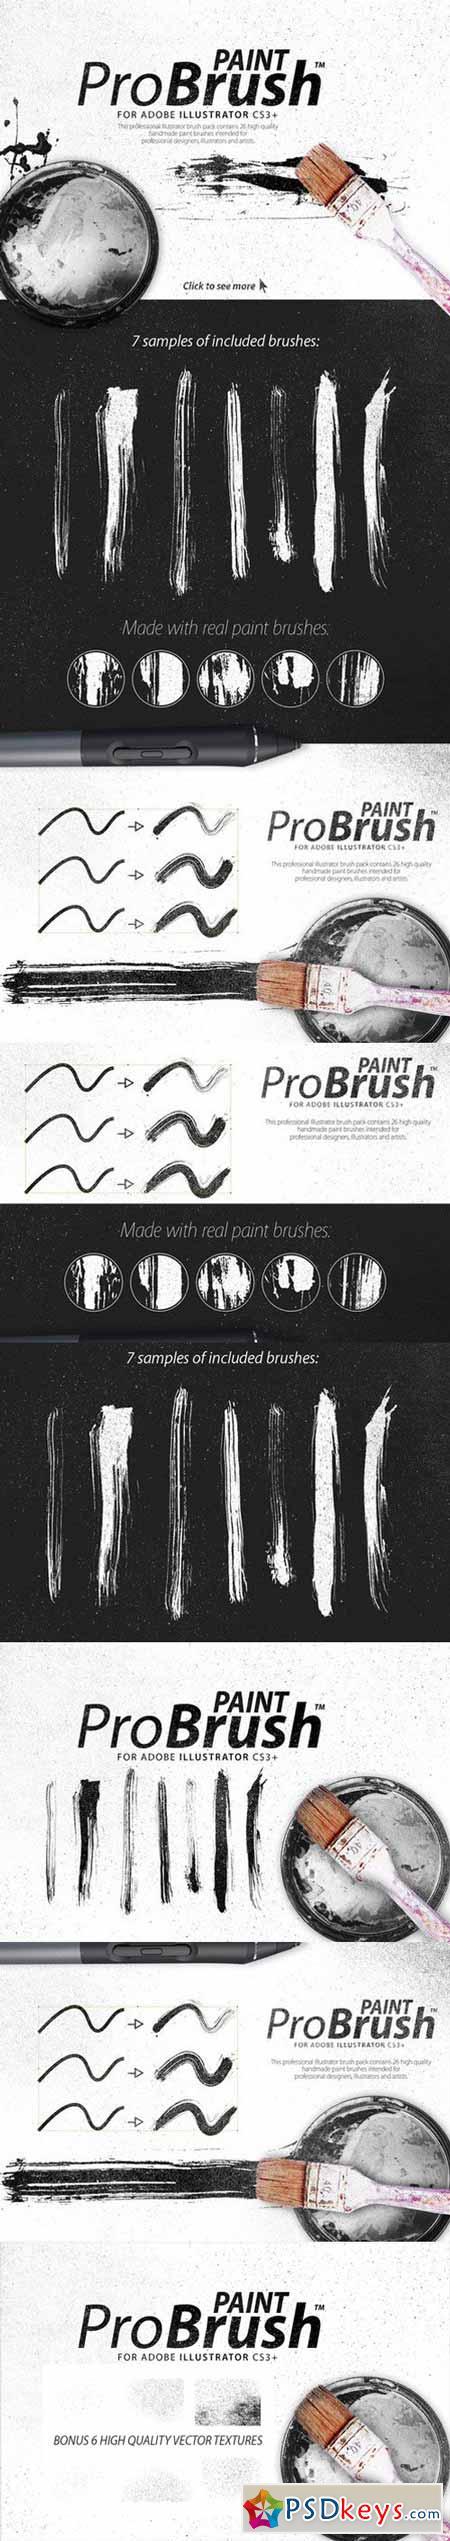 Paint ProBrush™ + Bonus Textures 558557